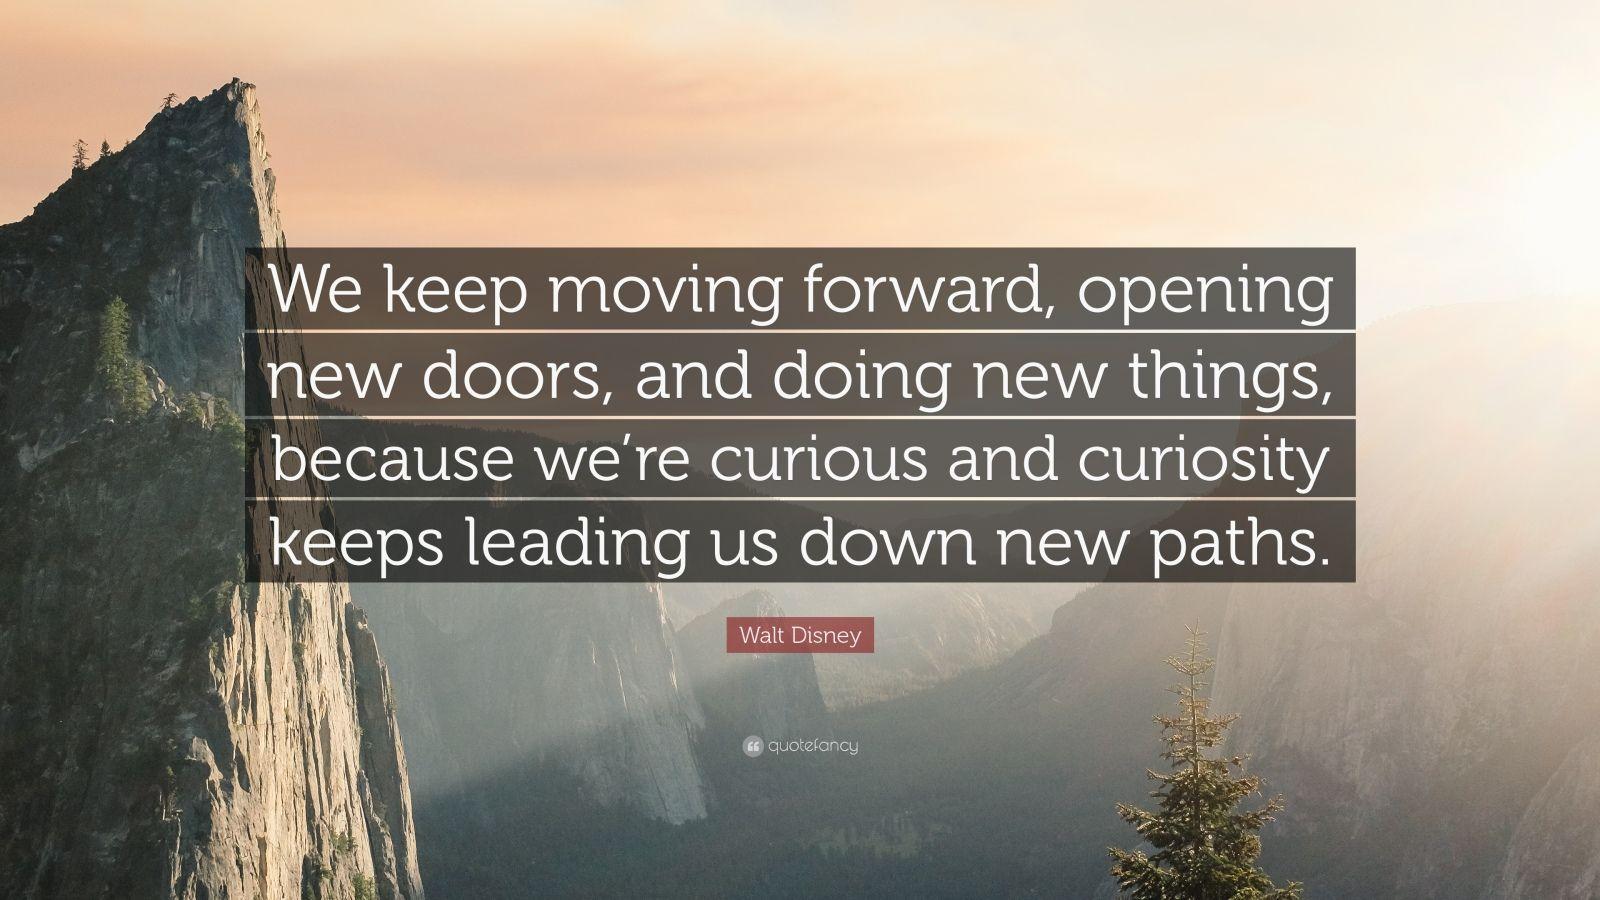 walt disney quote   u201cwe keep moving forward  opening new